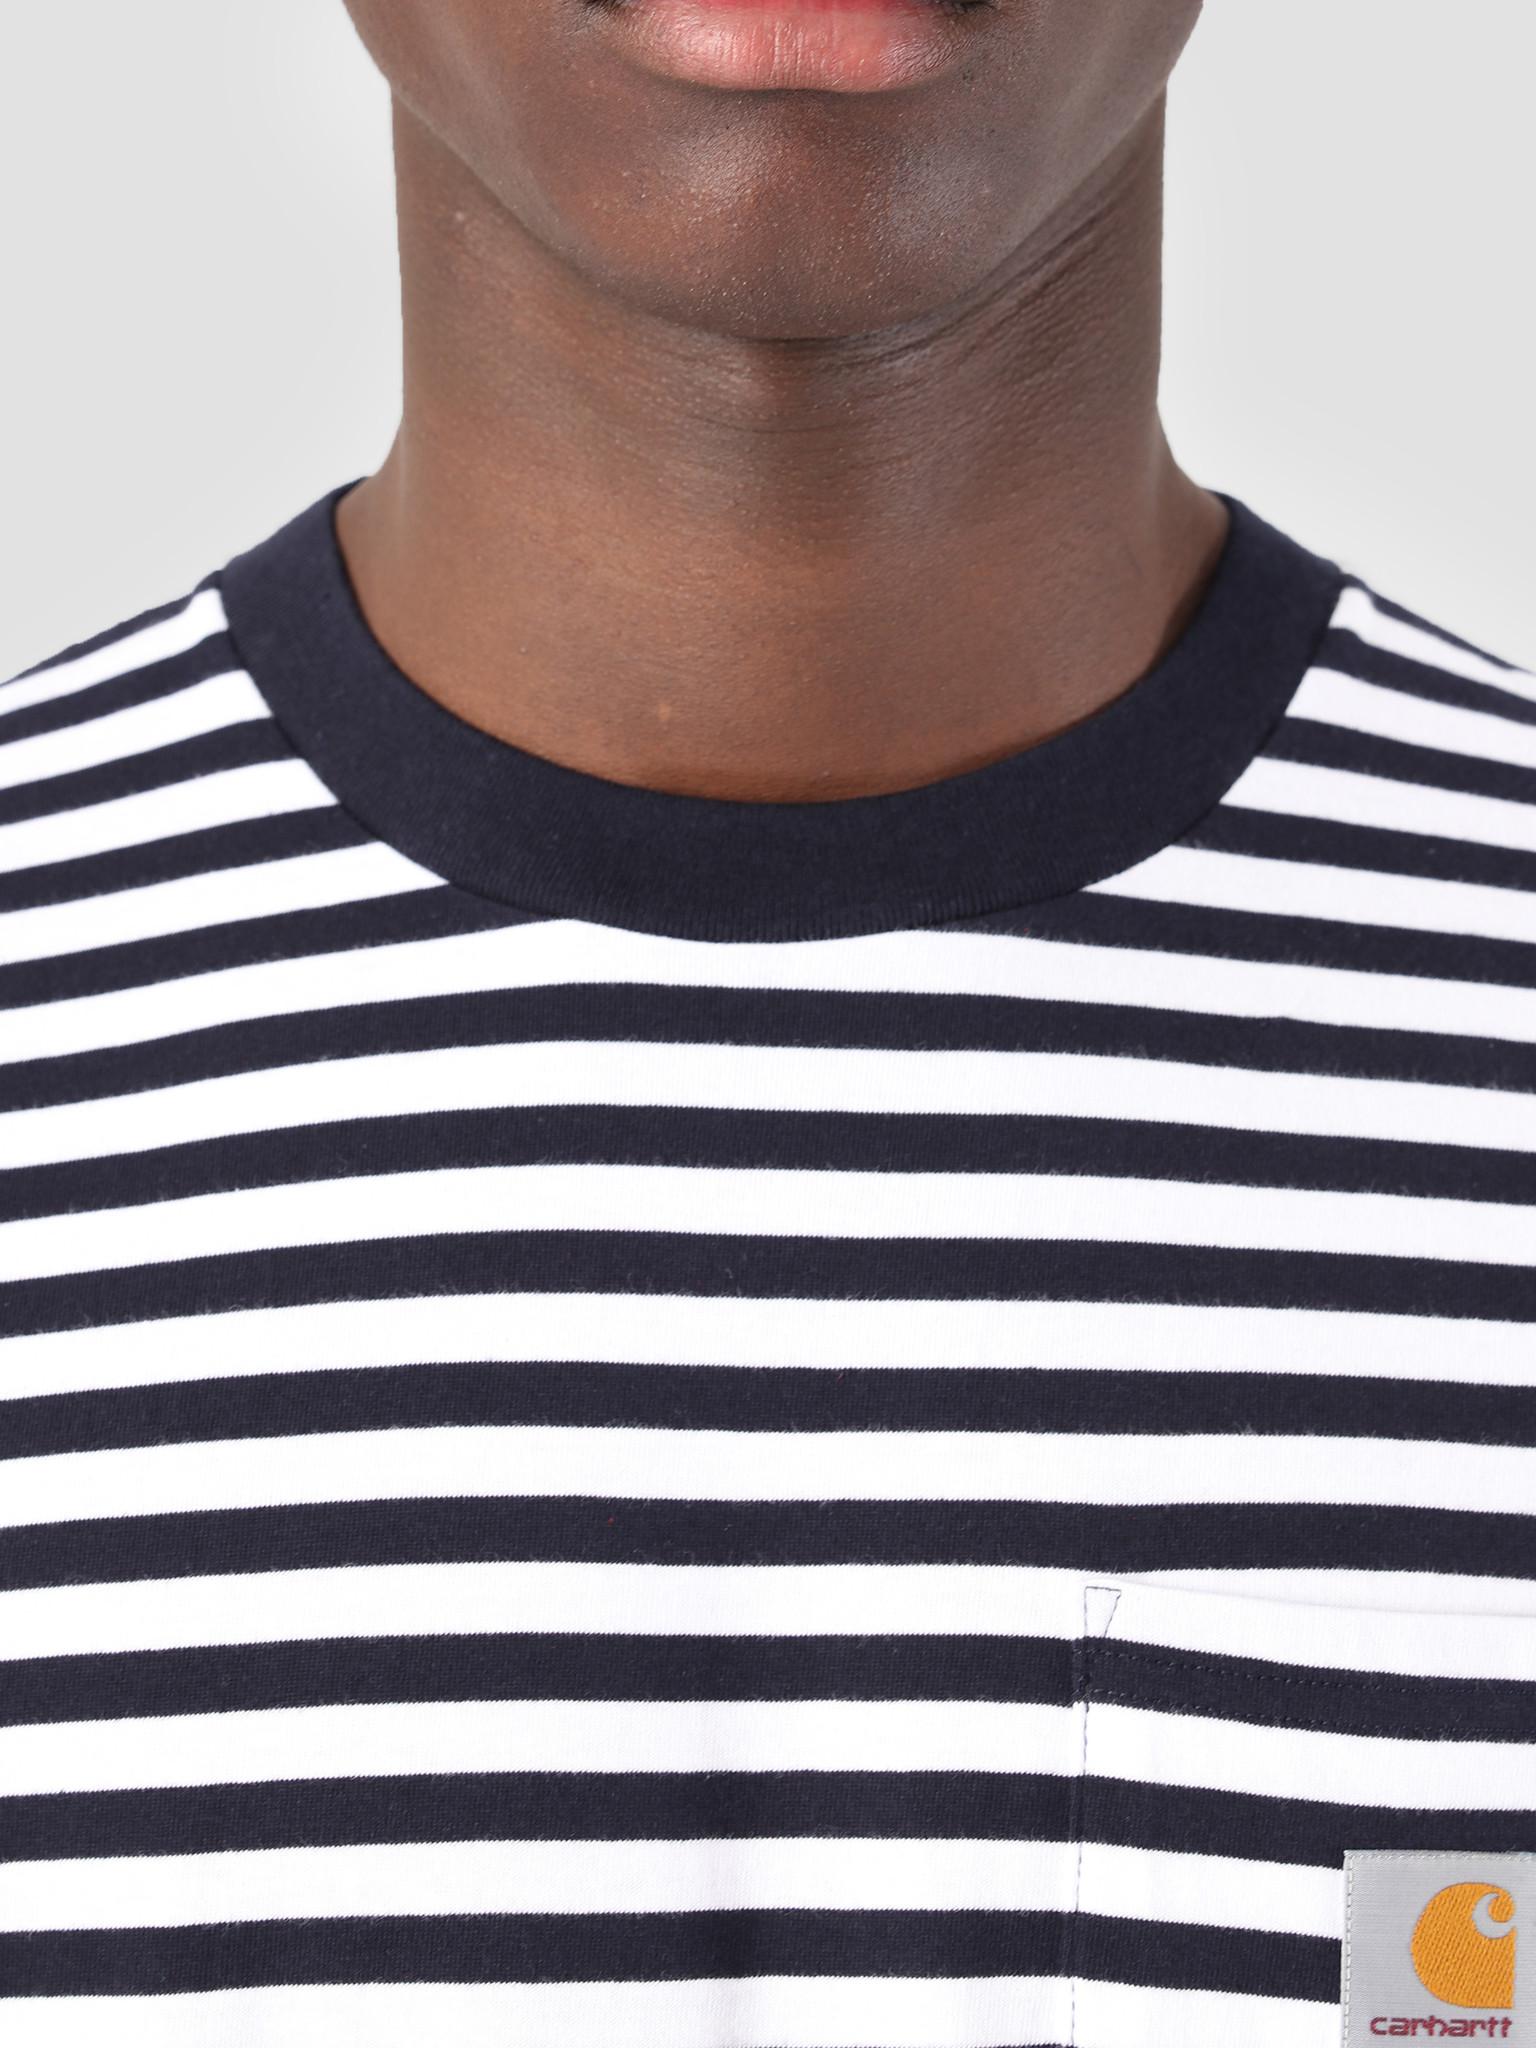 Carhartt WIP Carhartt WIP Barkley Pocket T-Shirt Stripe Barkley Stripe, Dark Navy White I026364